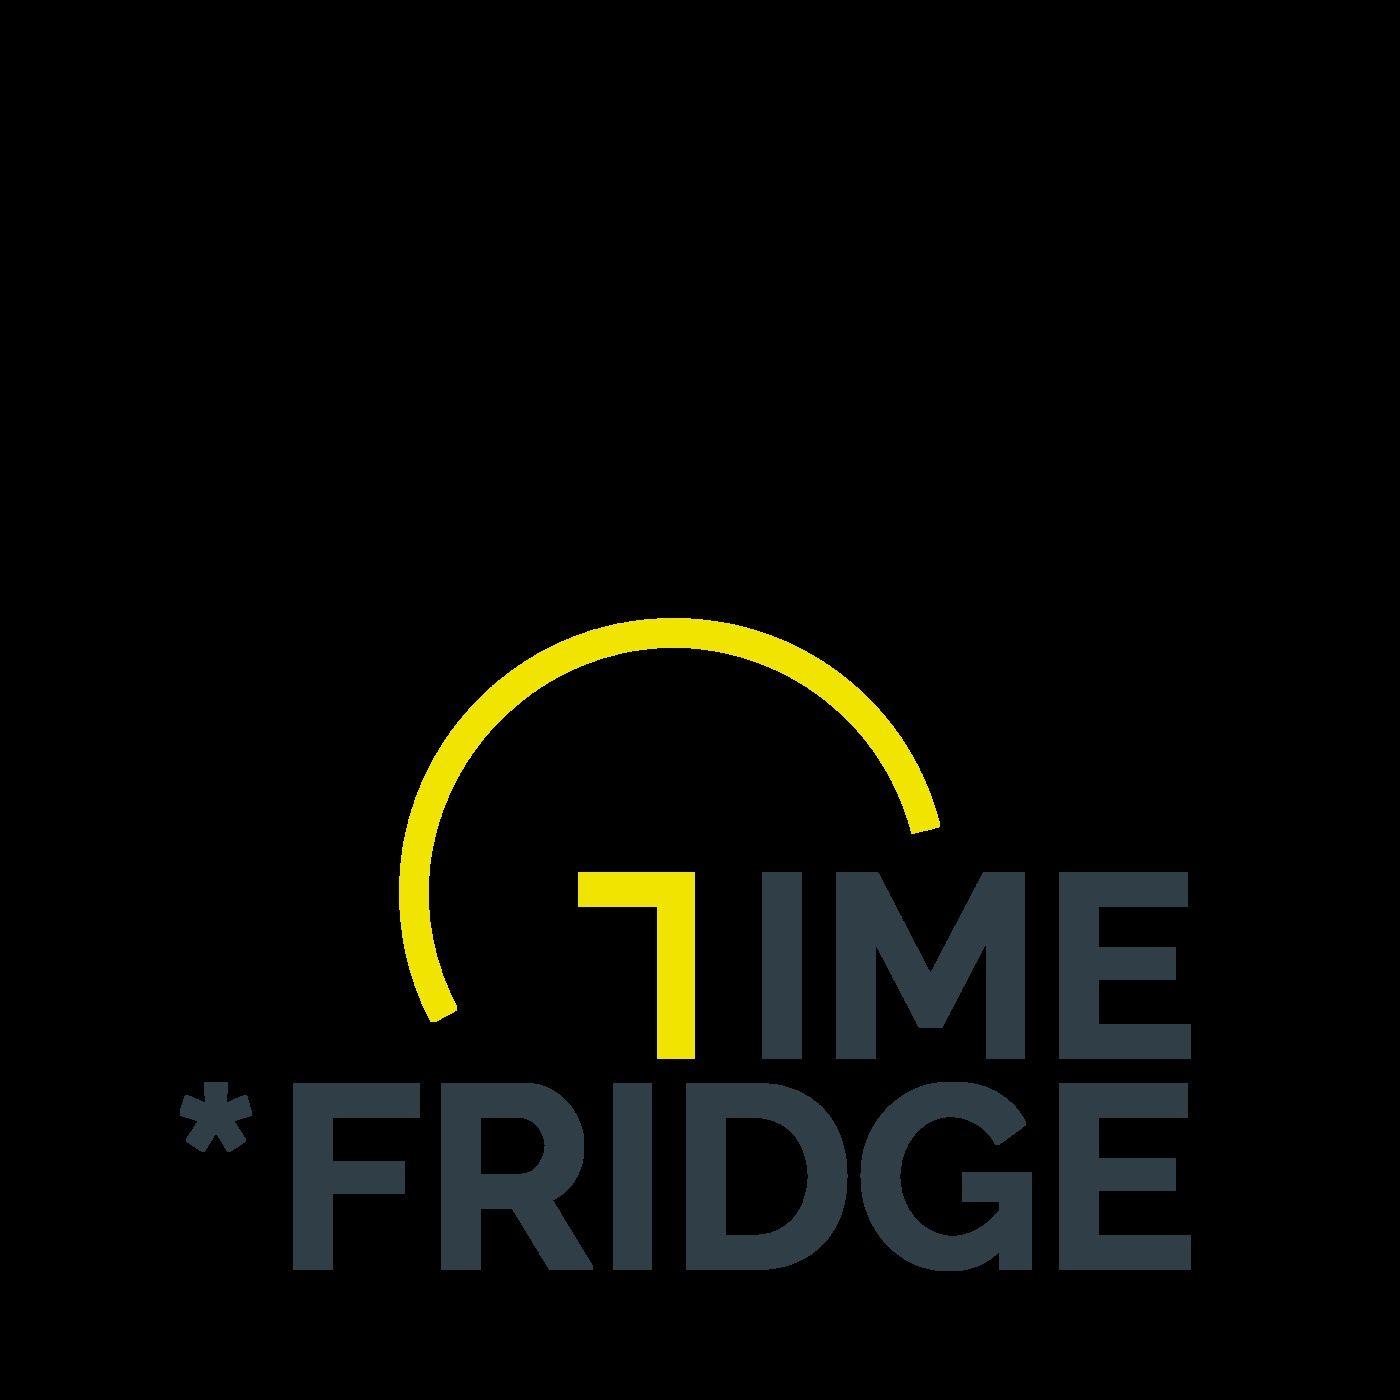 La Cucina - Time Fridge - s01e05